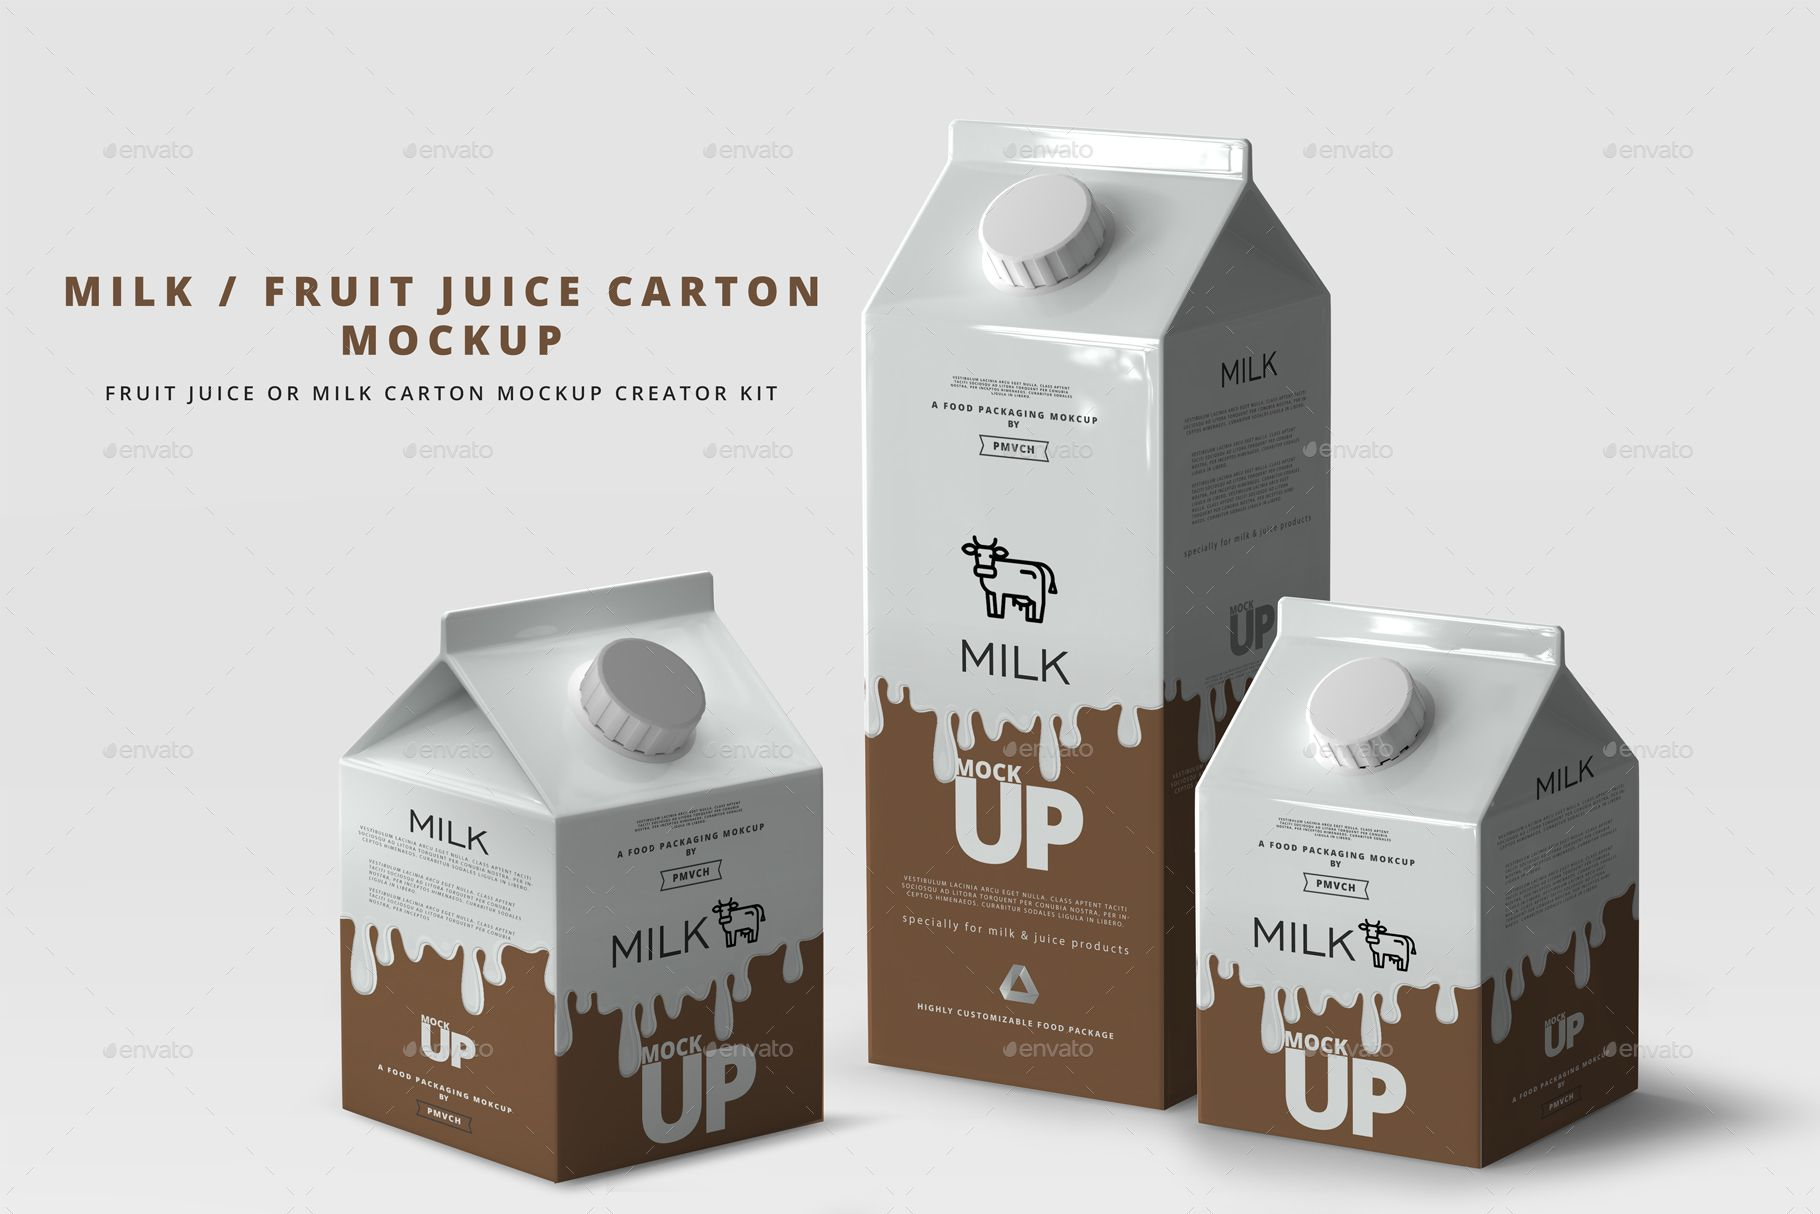 Download Milk Fruit Juice Carton Mockup Juice Carton Milk Packaging Milk